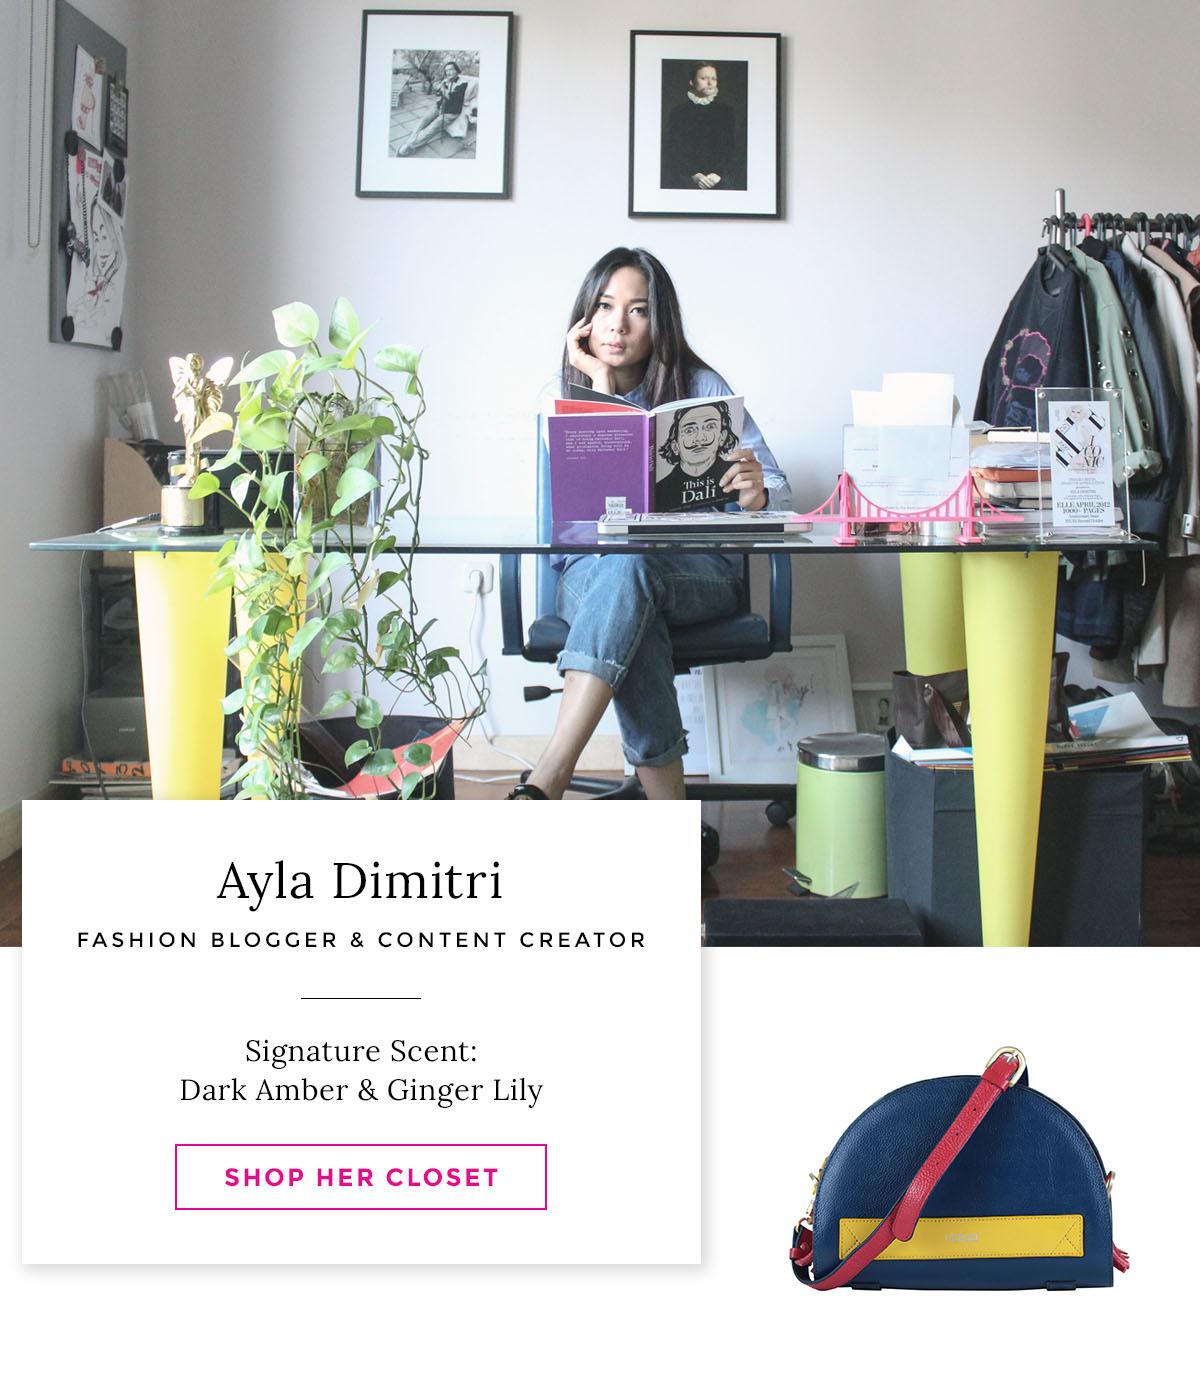 Ayla Dimitri